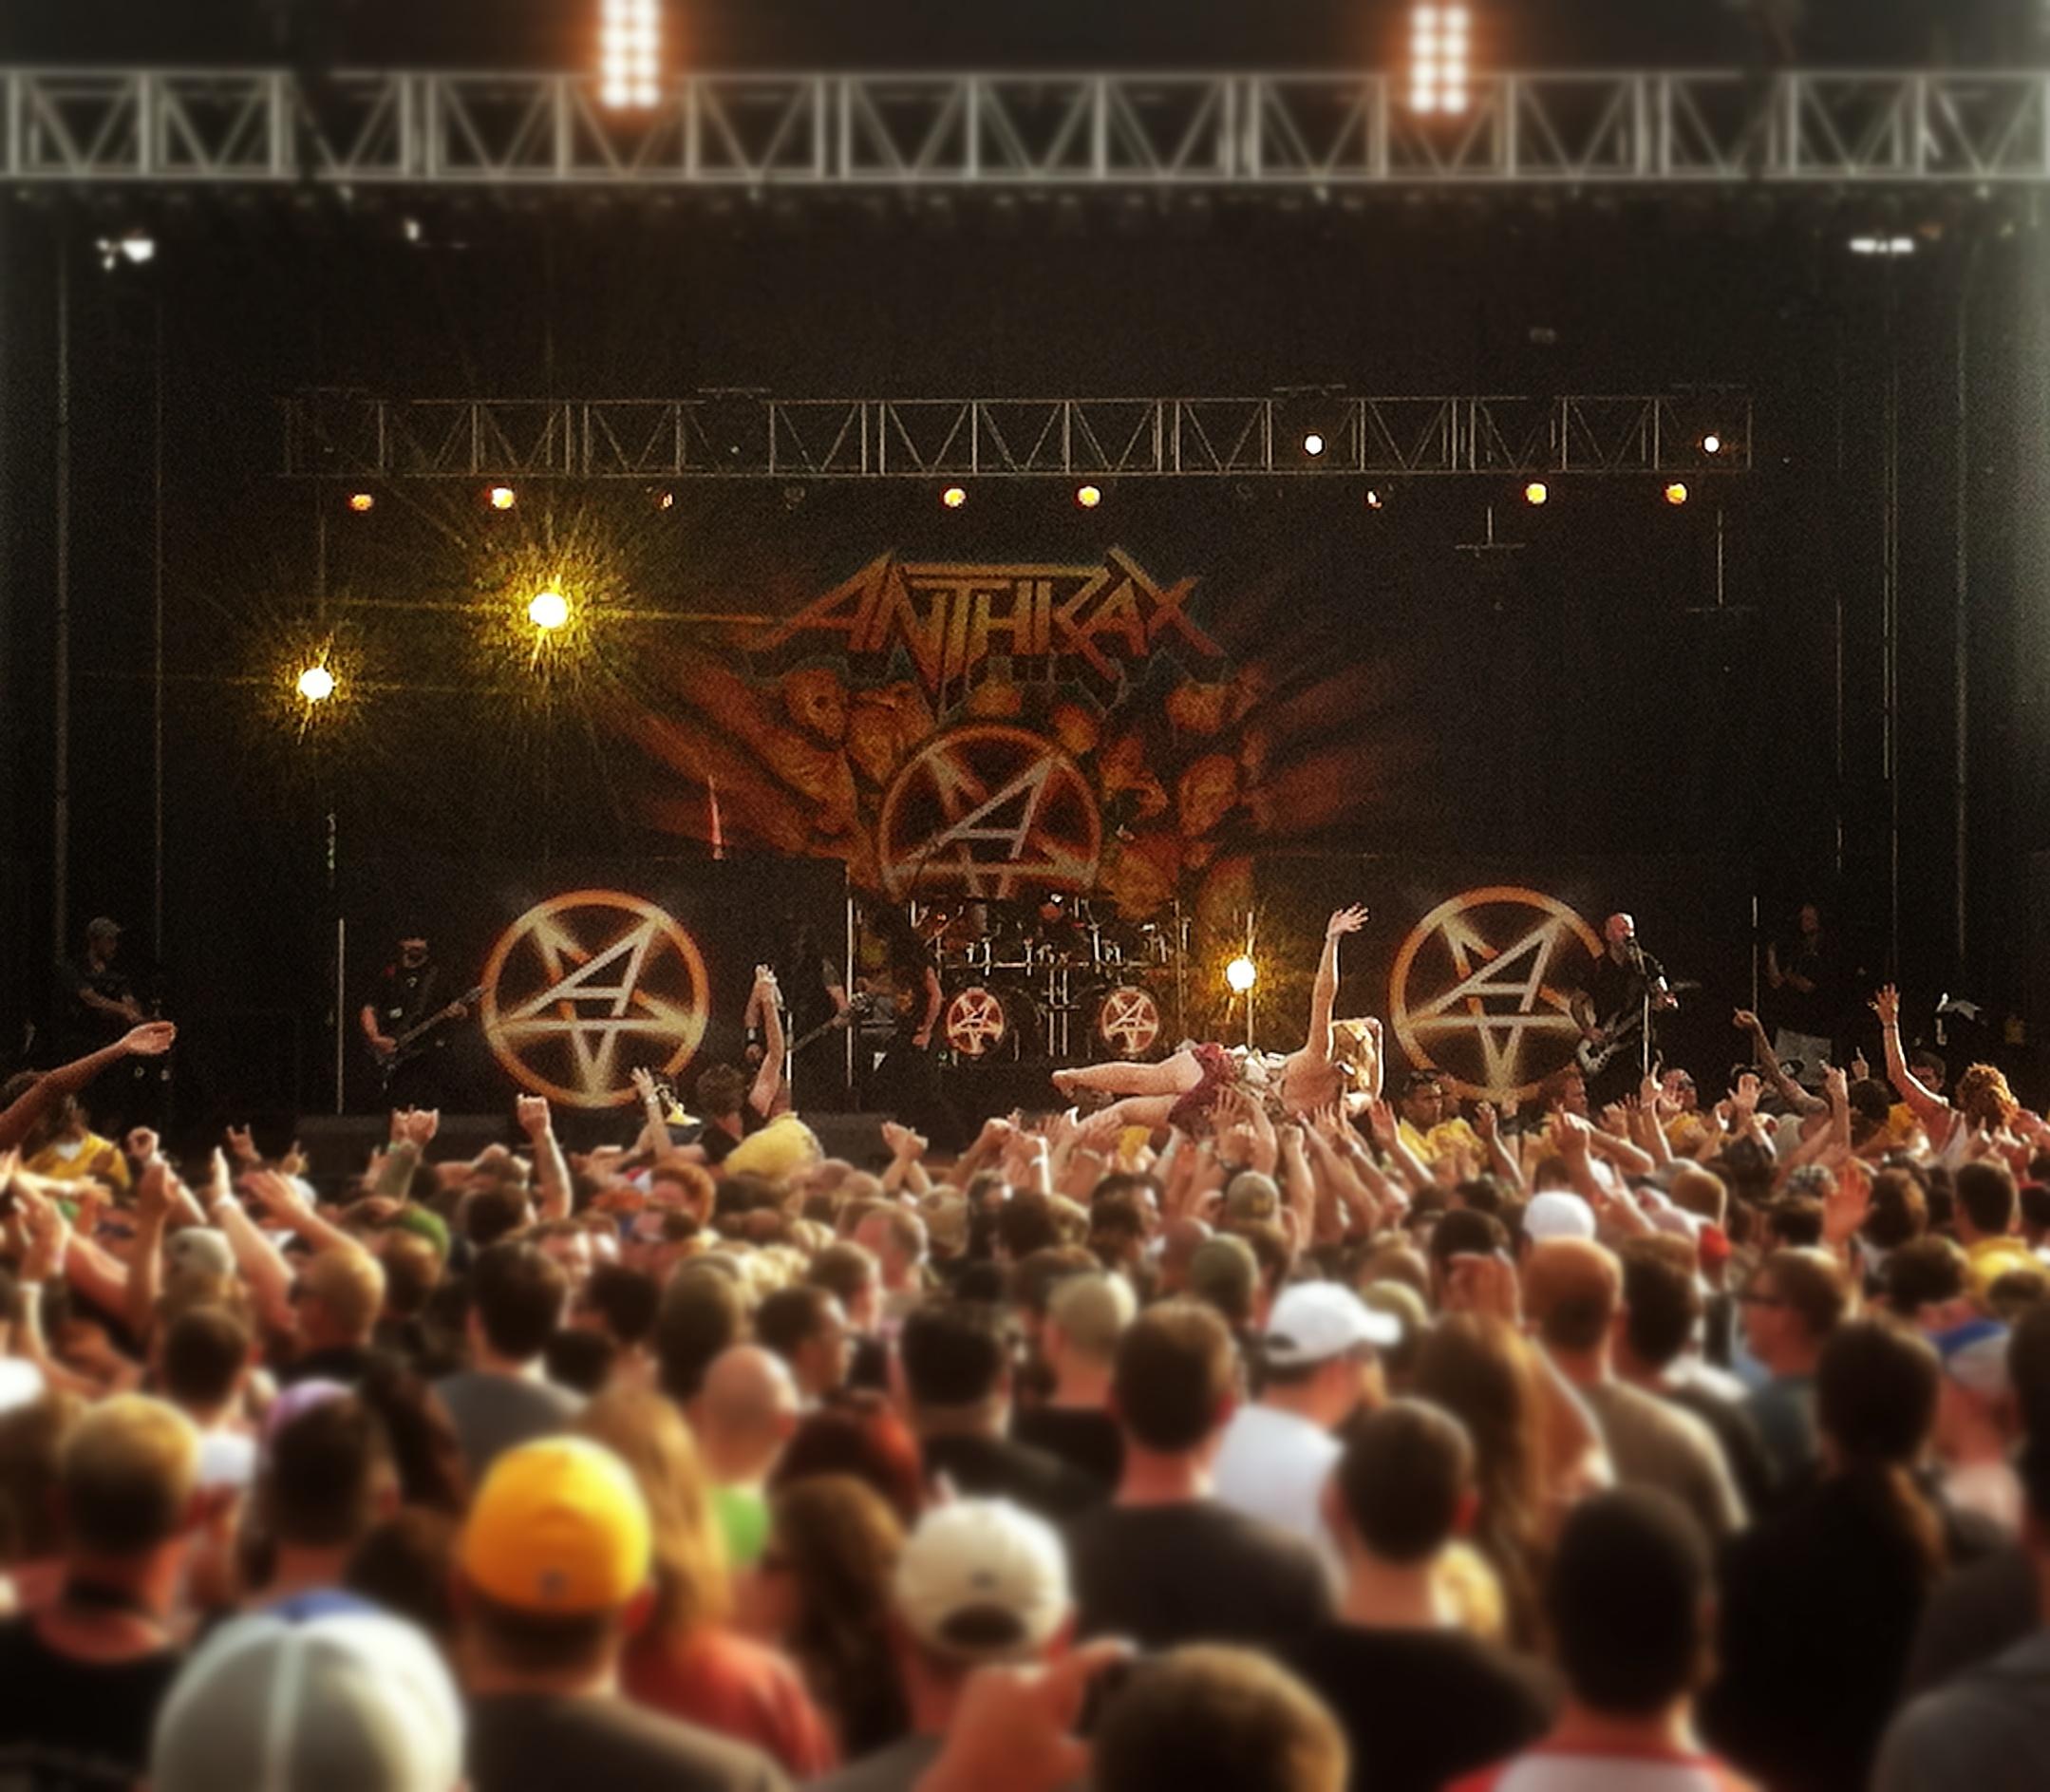 anthrax-crowd.jpg